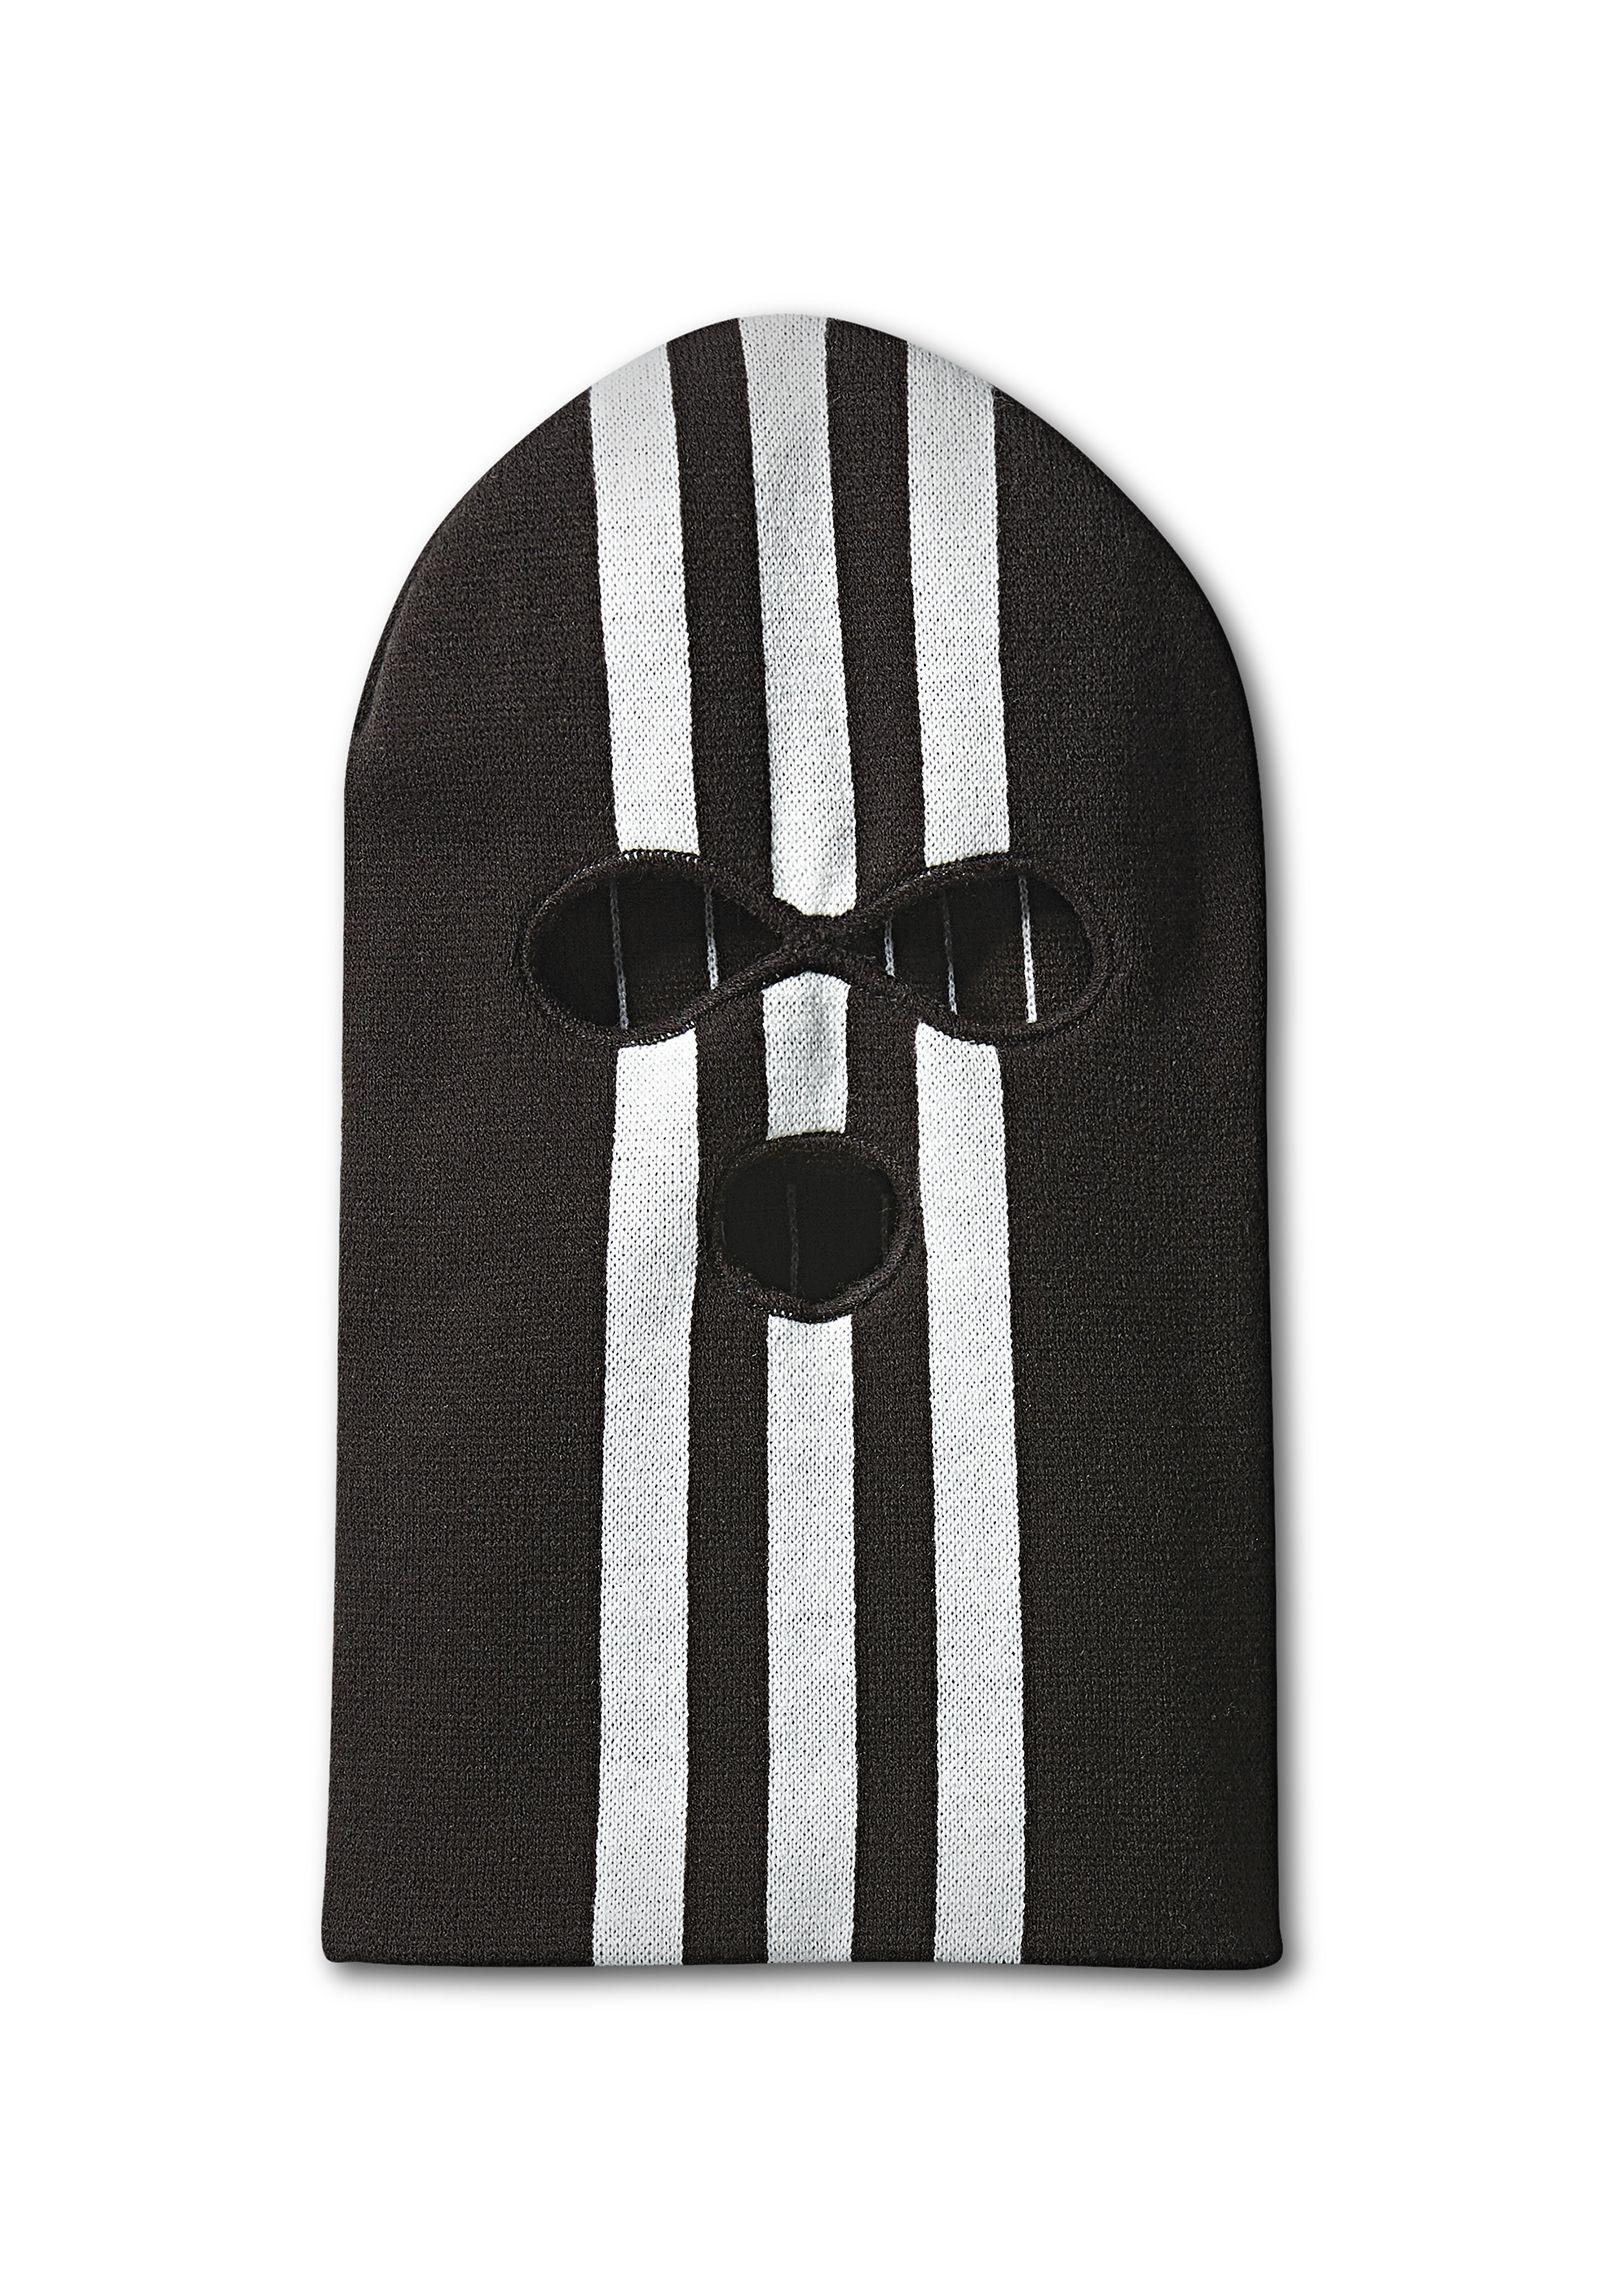 07b8af7e2c7 Lyst - Alexander Wang Adidas Originals By Aw Mask Beanie in Black